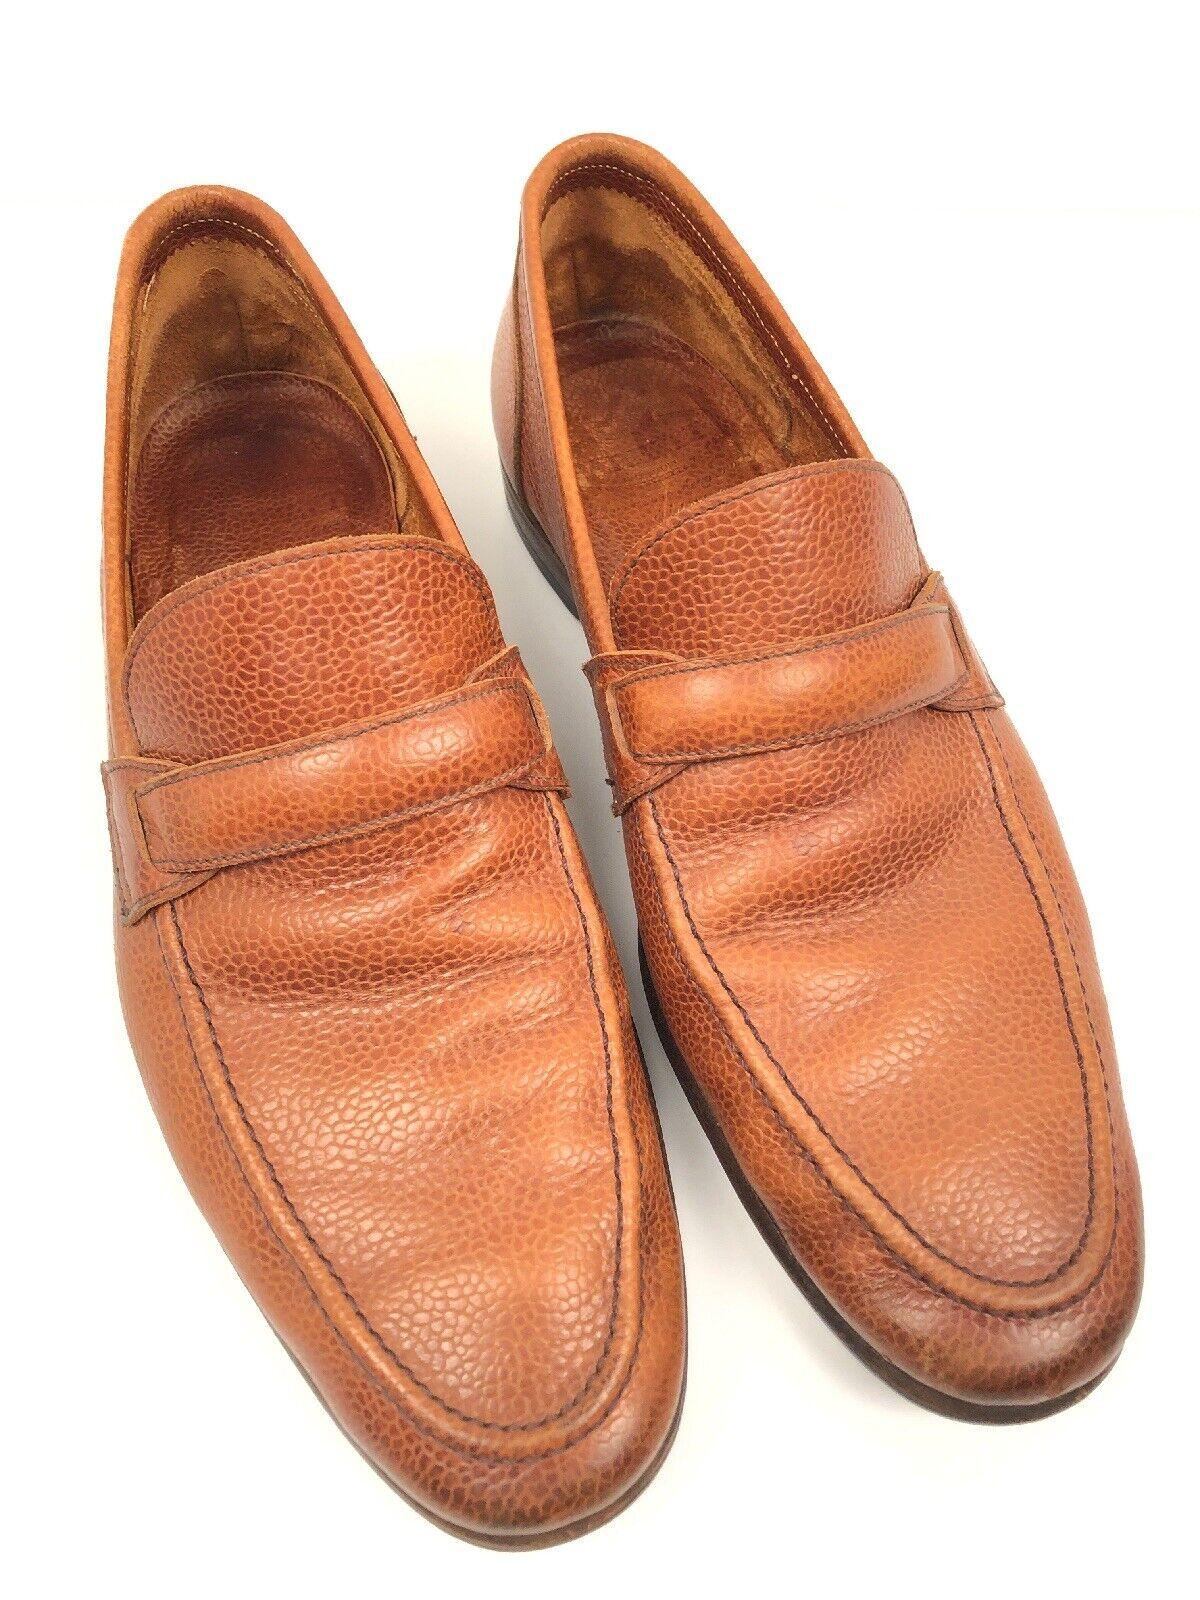 Mens Barrett Artigiana  Pebble Leather Loafers 9.5